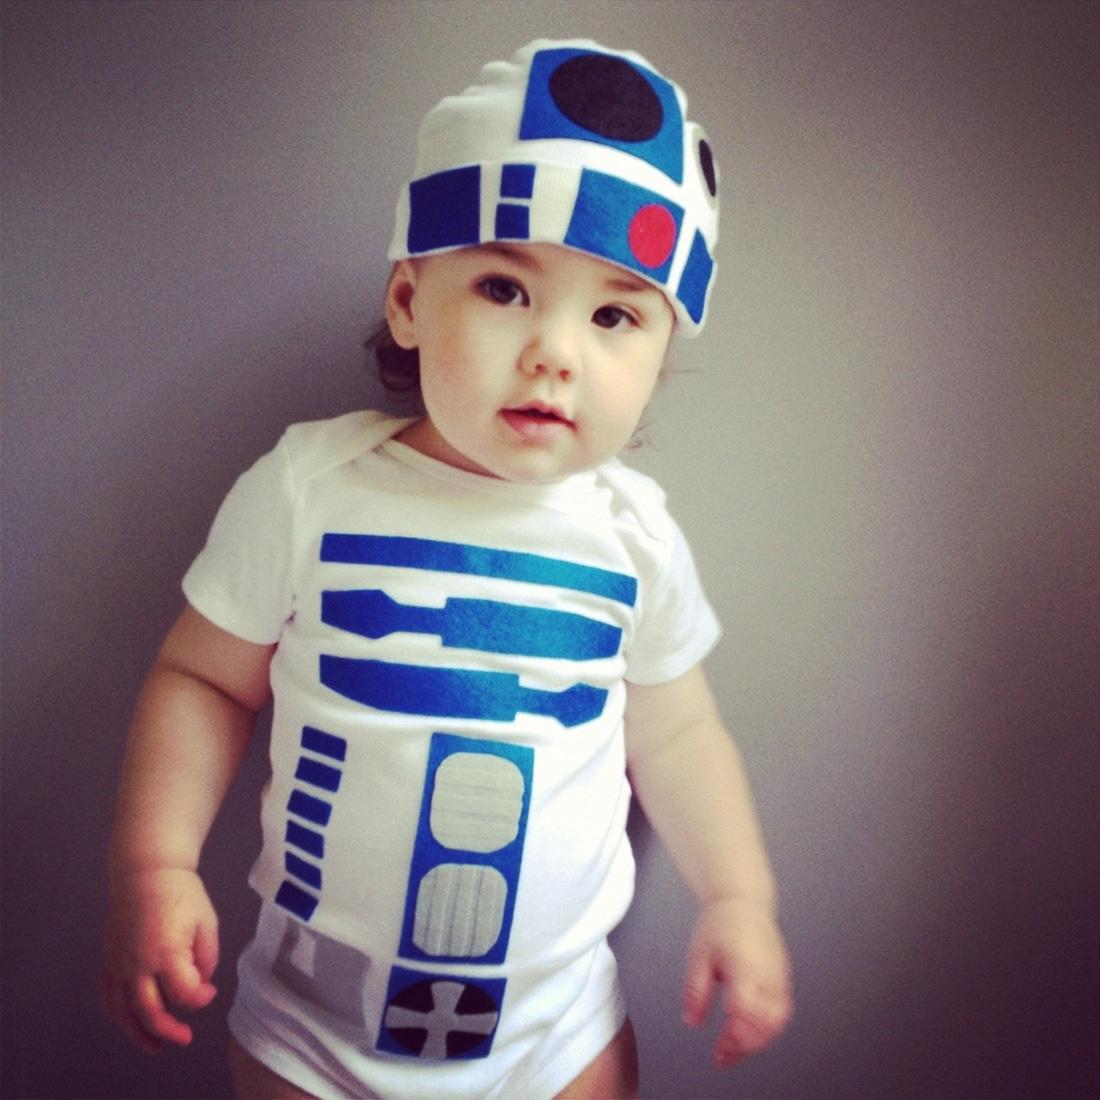 Baby-R2-D2-Costume